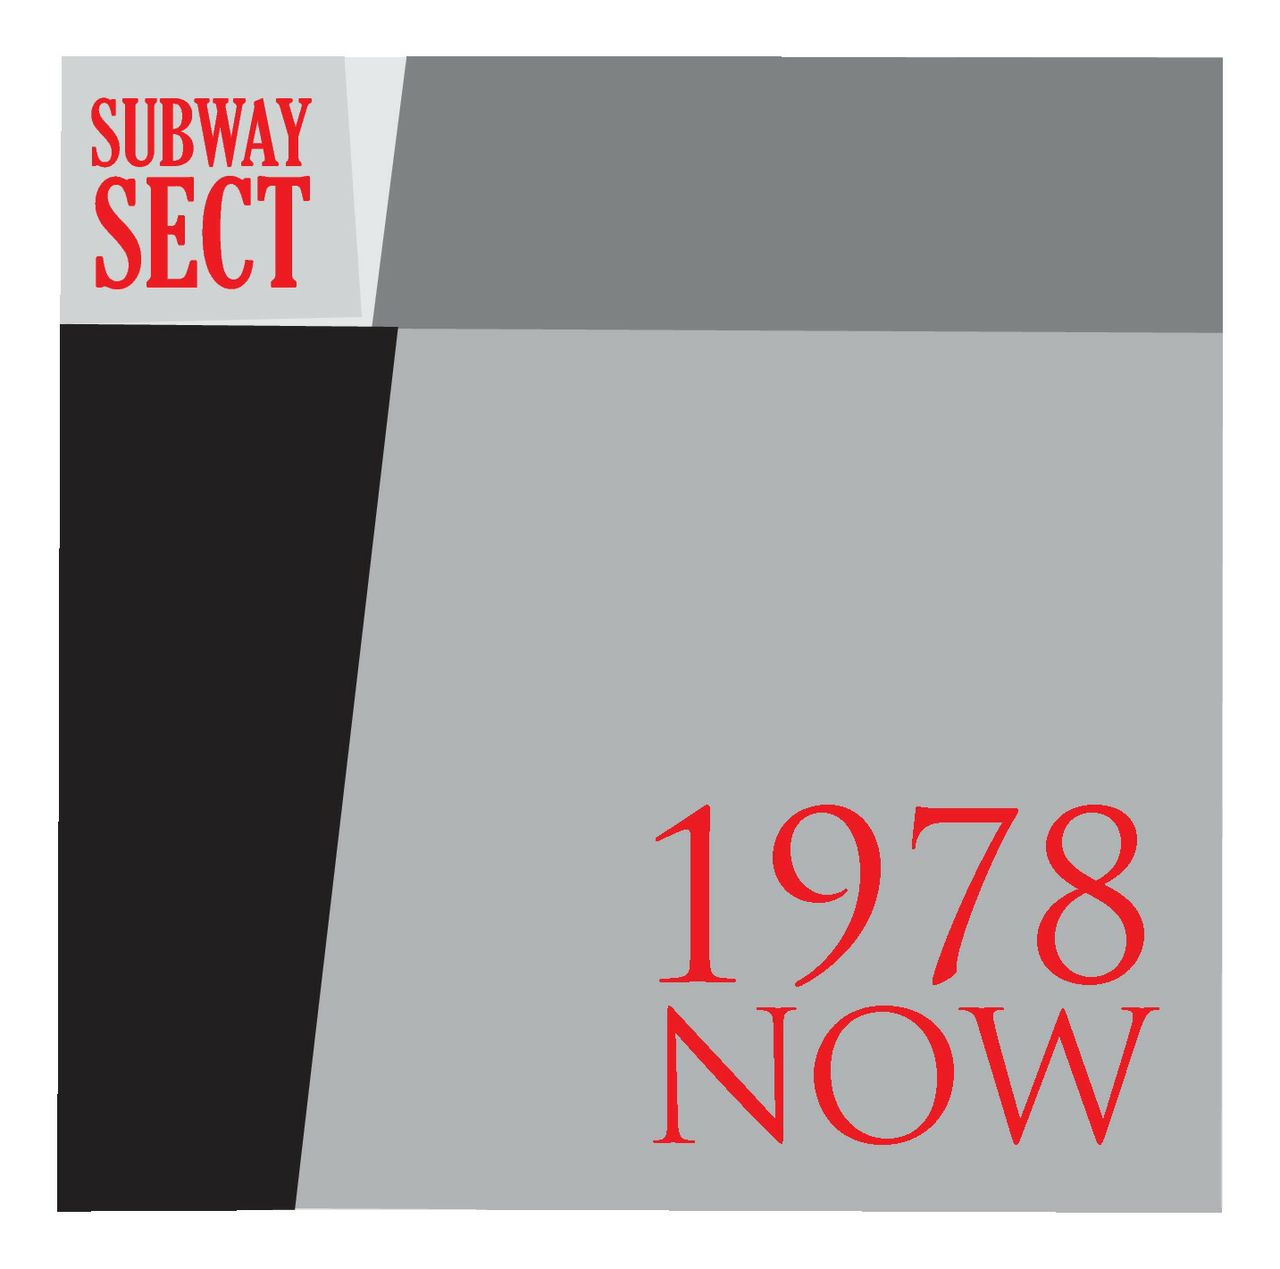 1978 Now